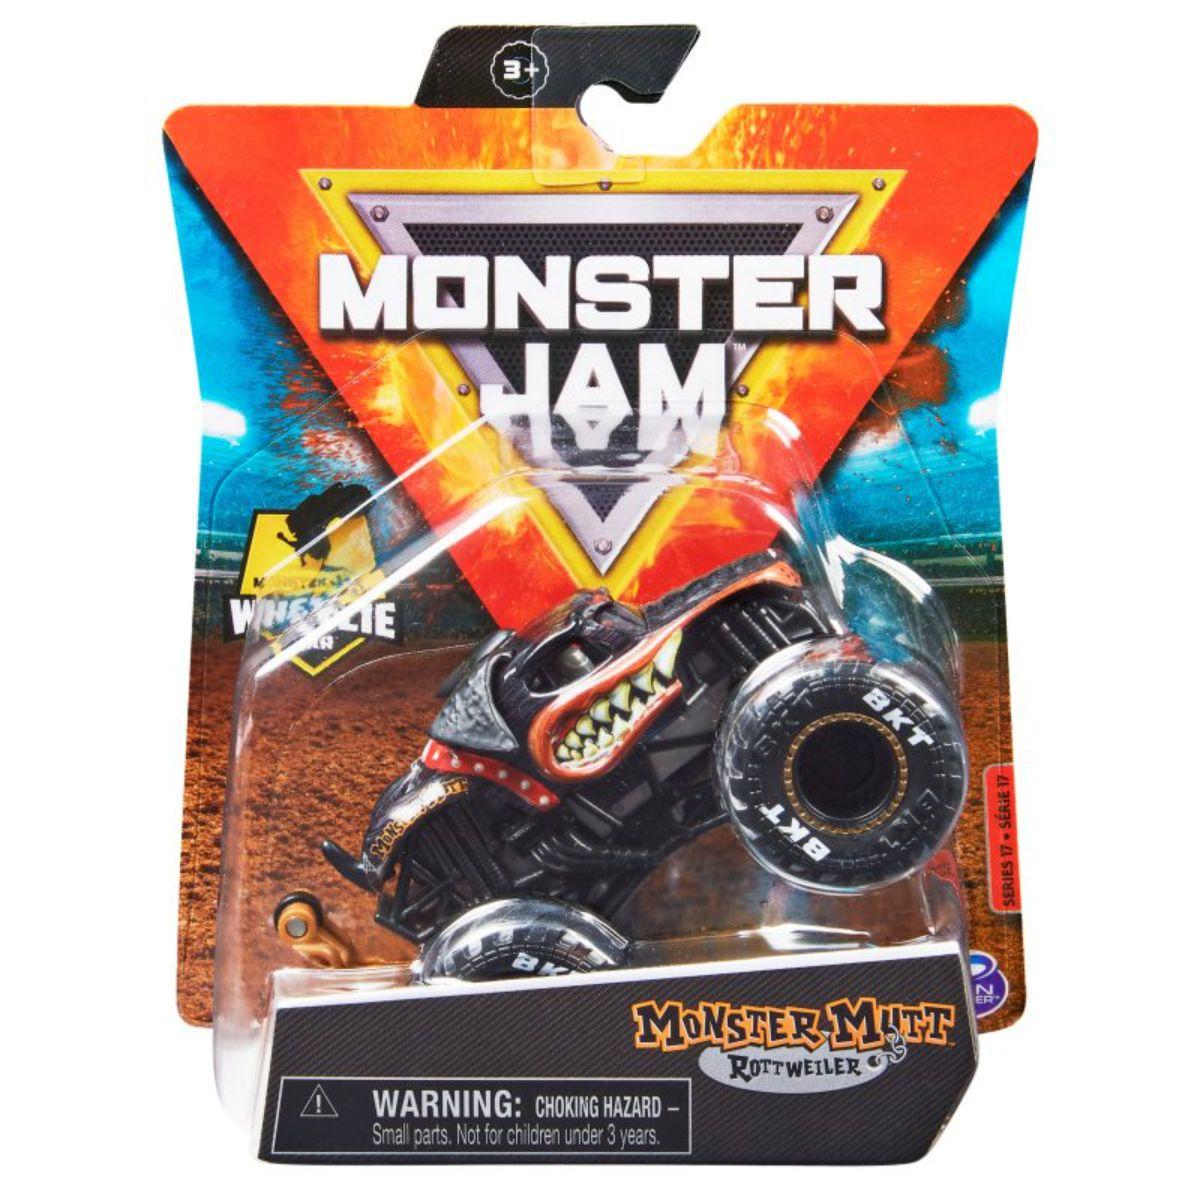 Masinuta Monster Jam, Scara 1:64, Monster Mutt Rottweiler, 20130586